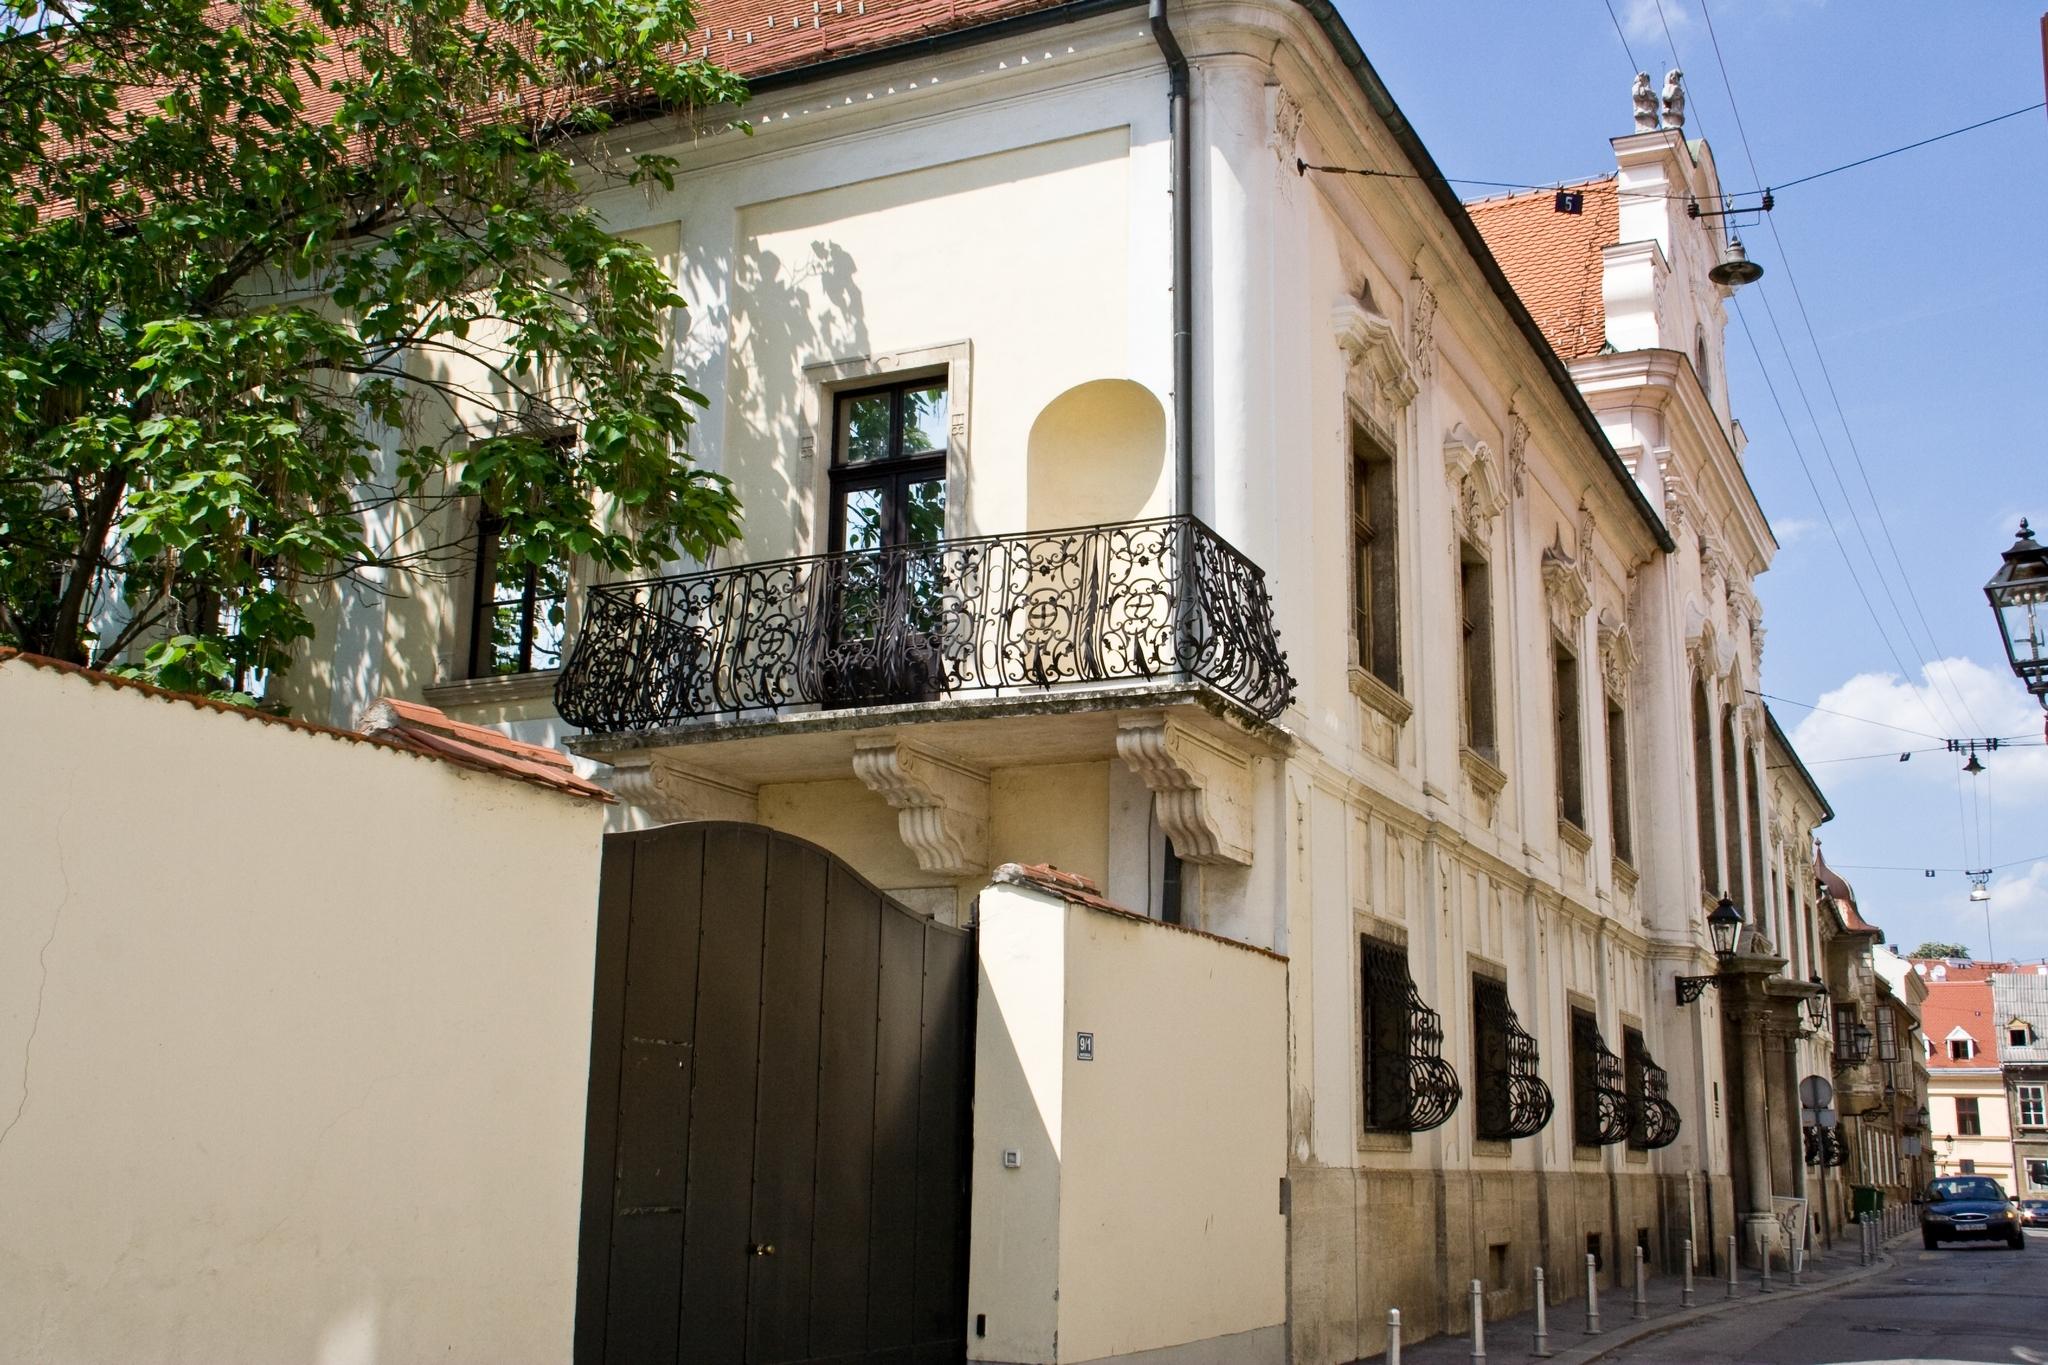 croatian history museum, museums, zagreb, croatia